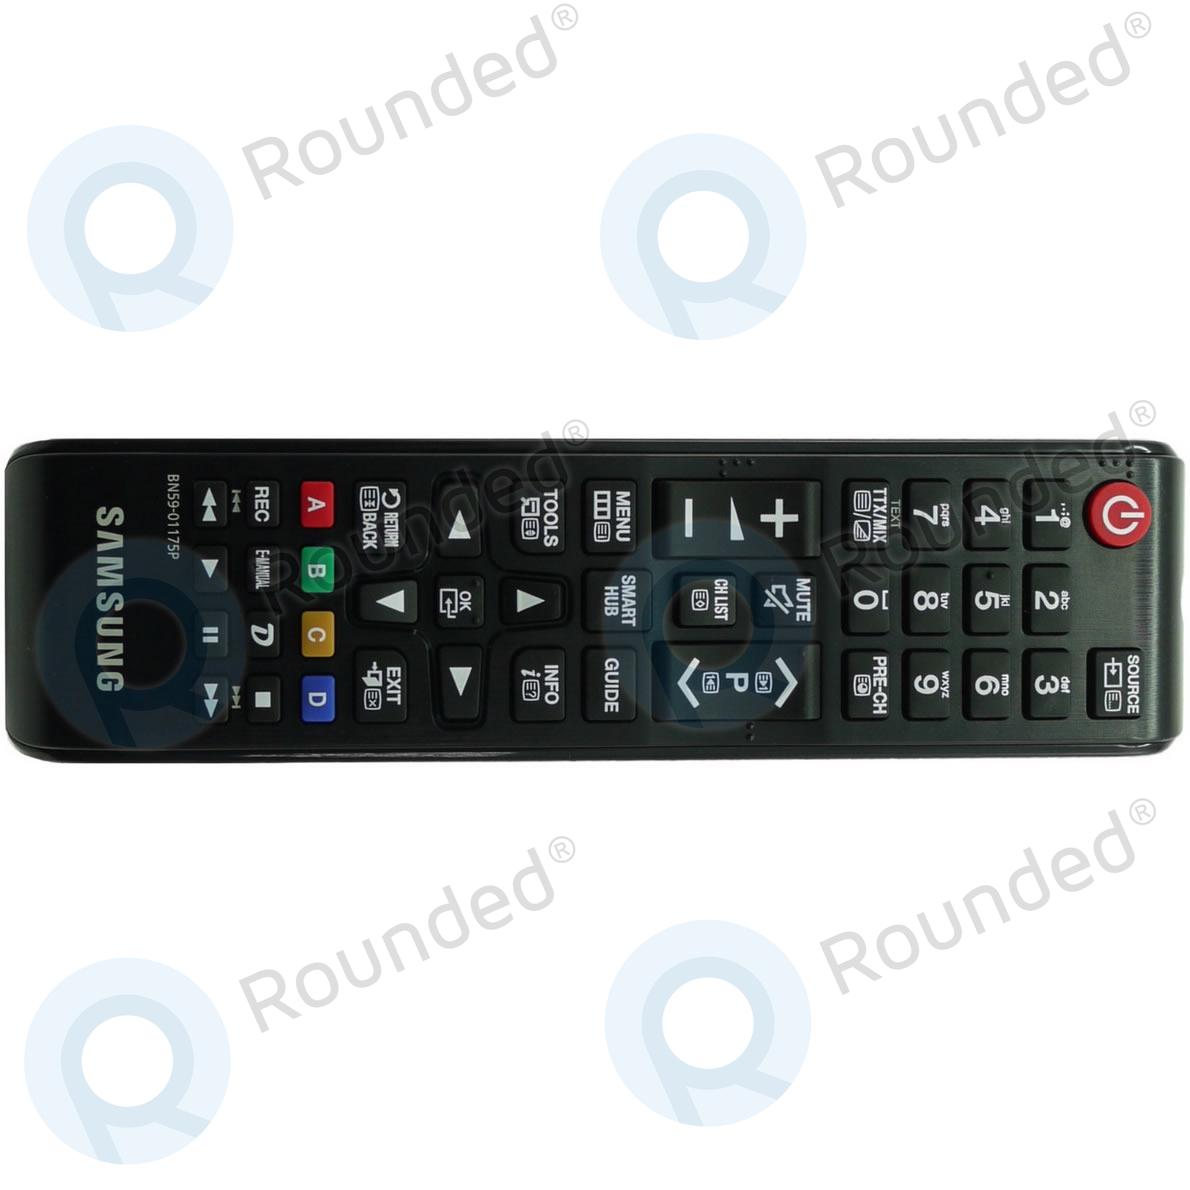 Samsung  Remote control TM1240A  (BN59-01175P) BN59-01175P image-1